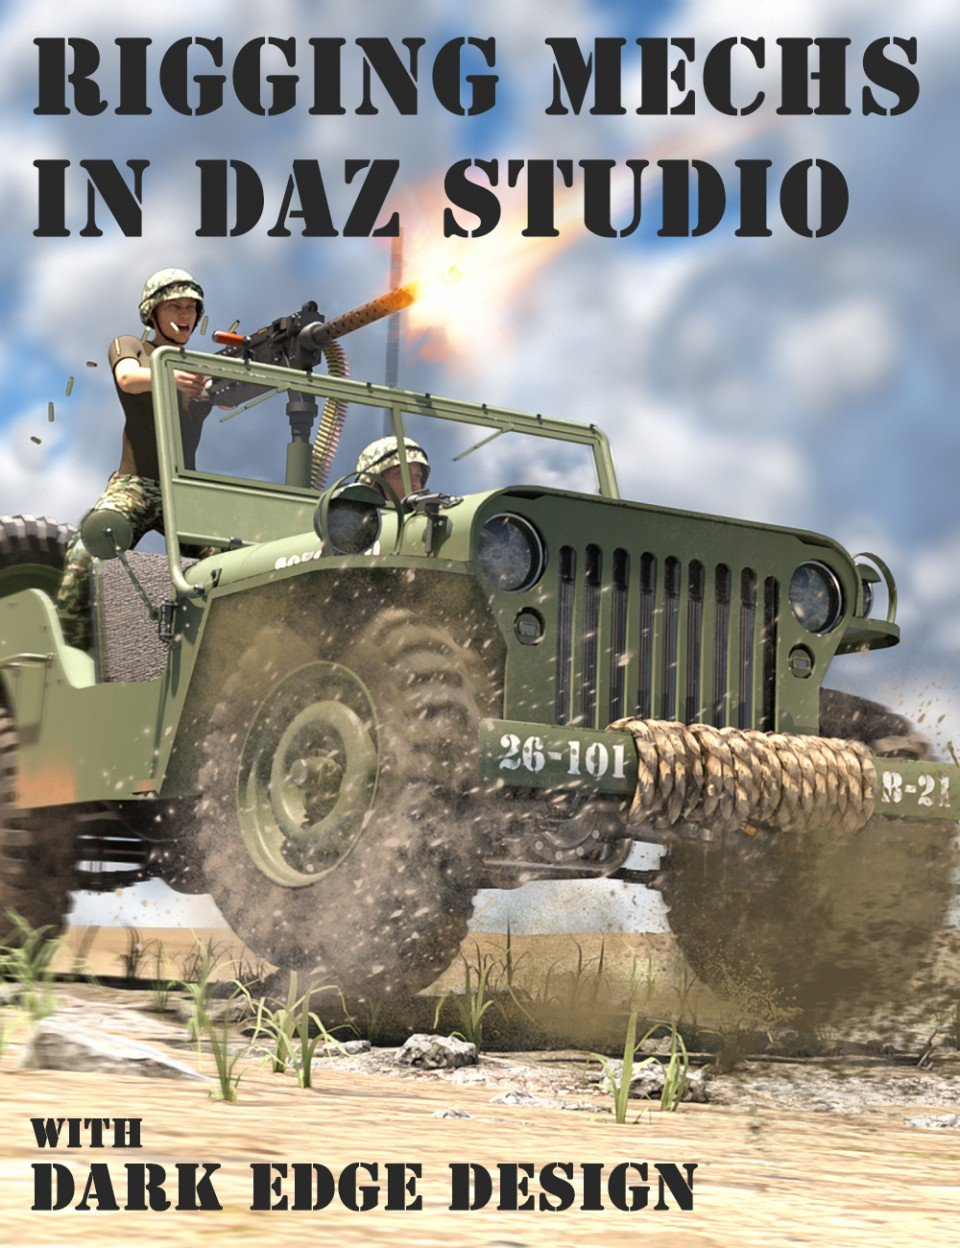 Rigging Vehicles and Mechs in Daz Studio_DAZ3D下载站